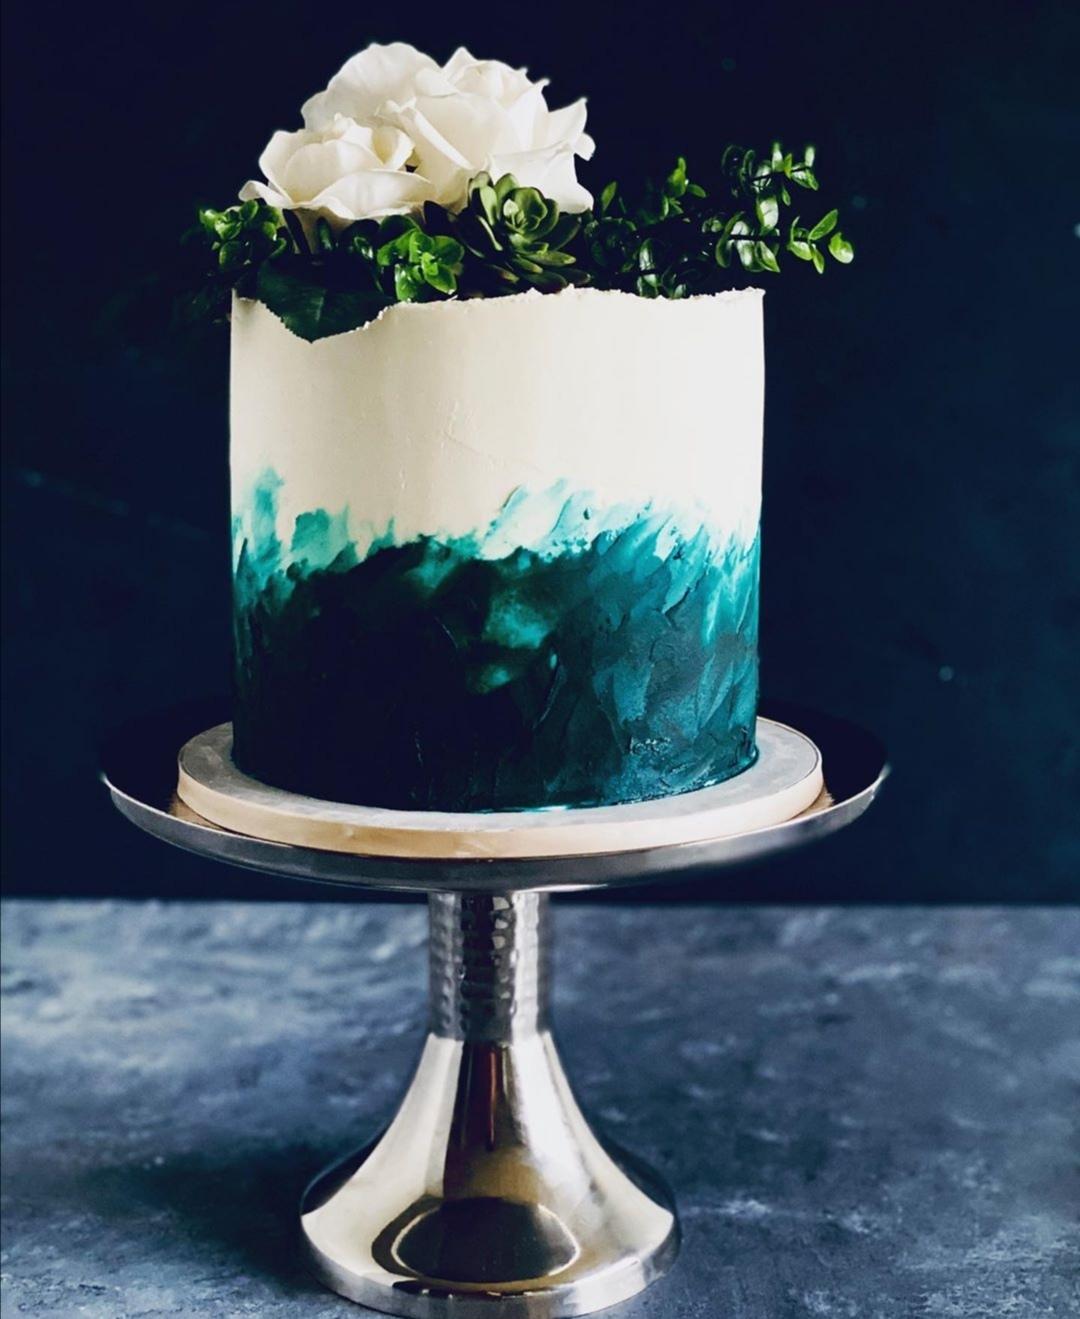 Teale one tier wedding cake